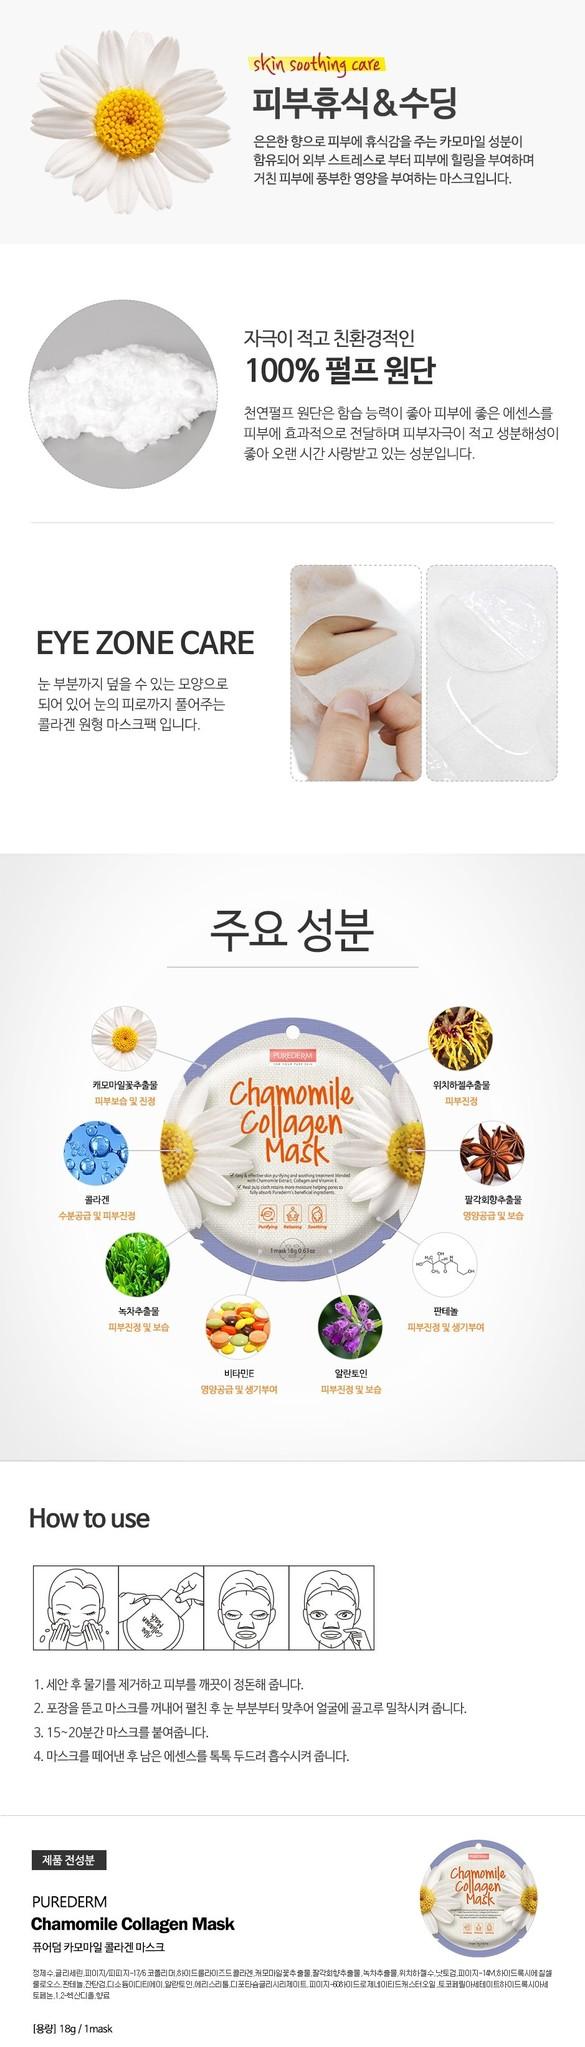 Circle Mask - Chamomile Collagen-3